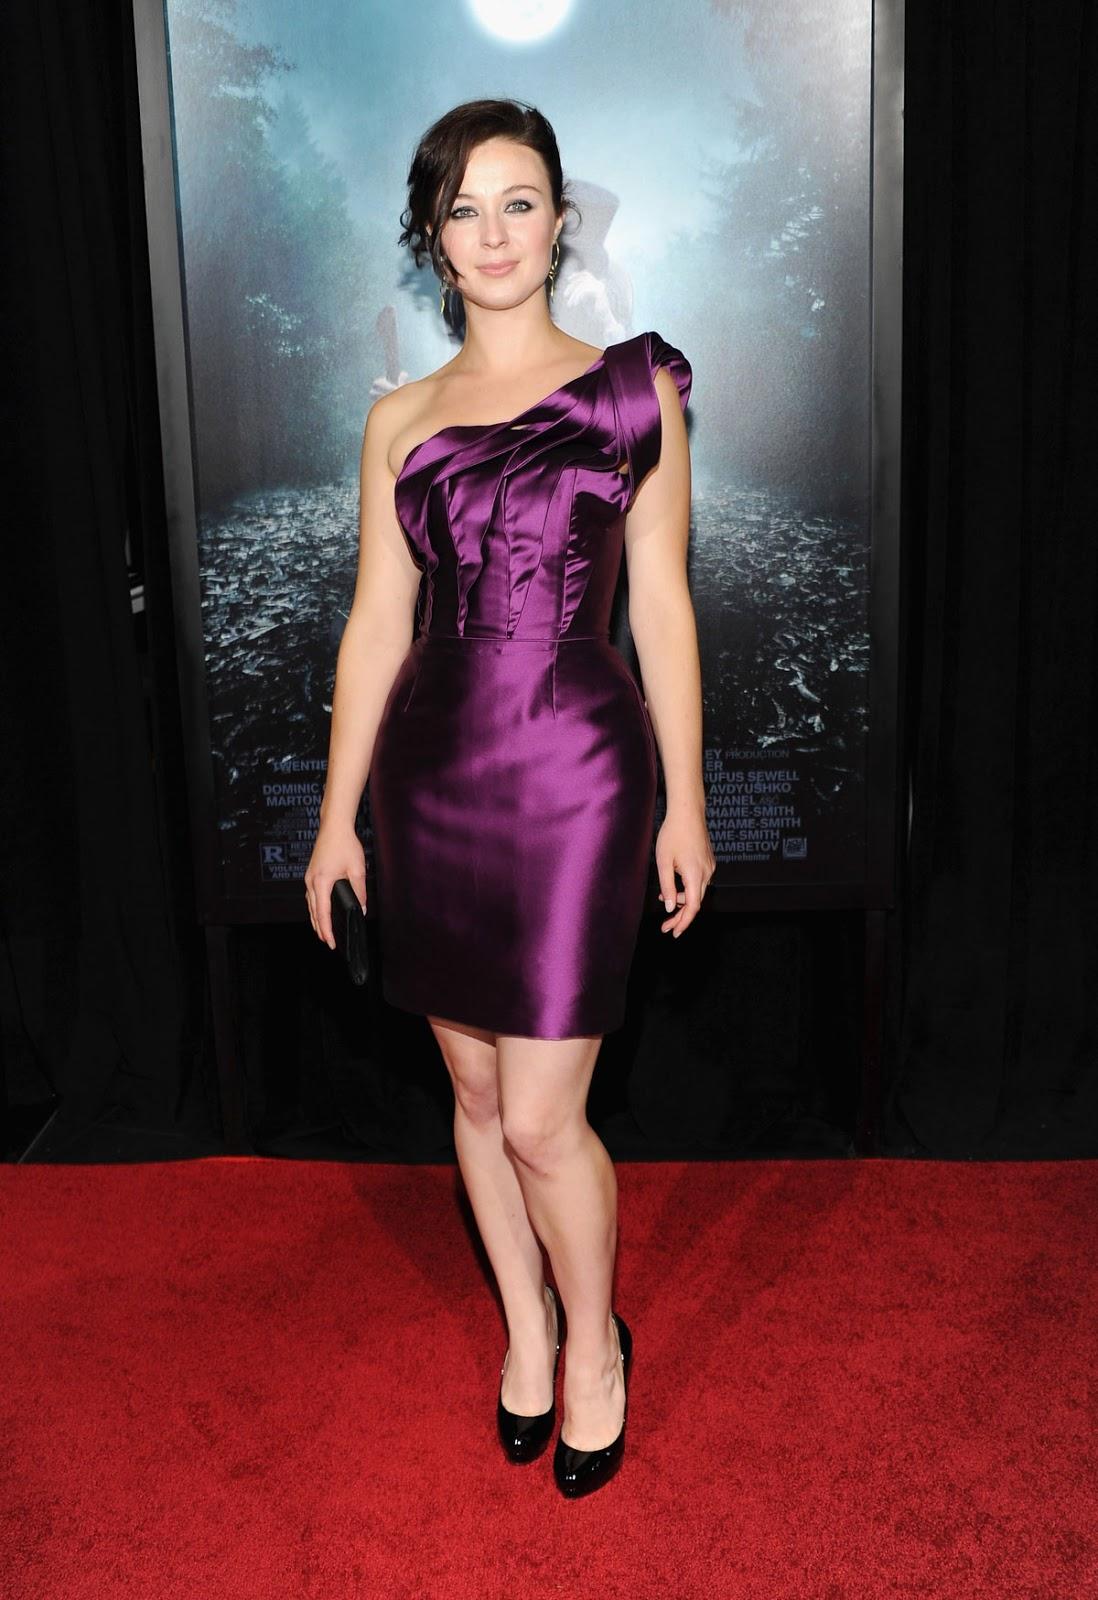 Abraham Lincoln Vampire Hunter actress Robin McLeavy HD Photos & Wallpapers